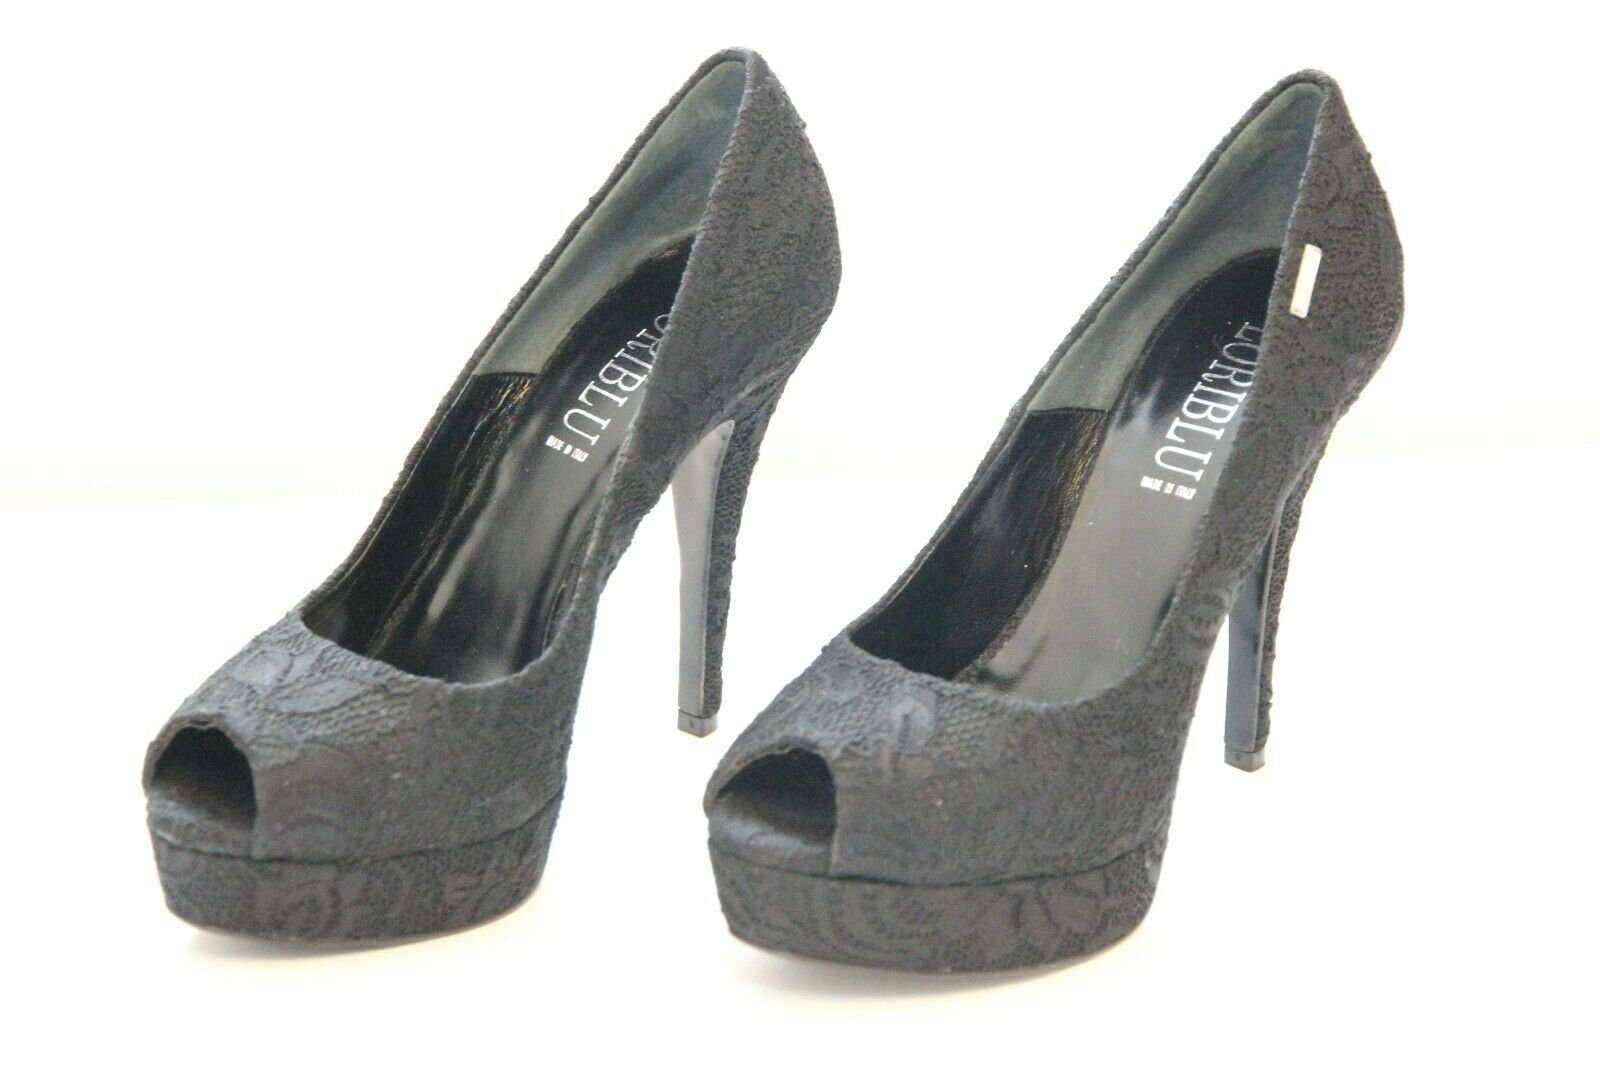 LORIblue Pumps Women's Platform Heel Italian shoes Vero Cuoio 38 Made in